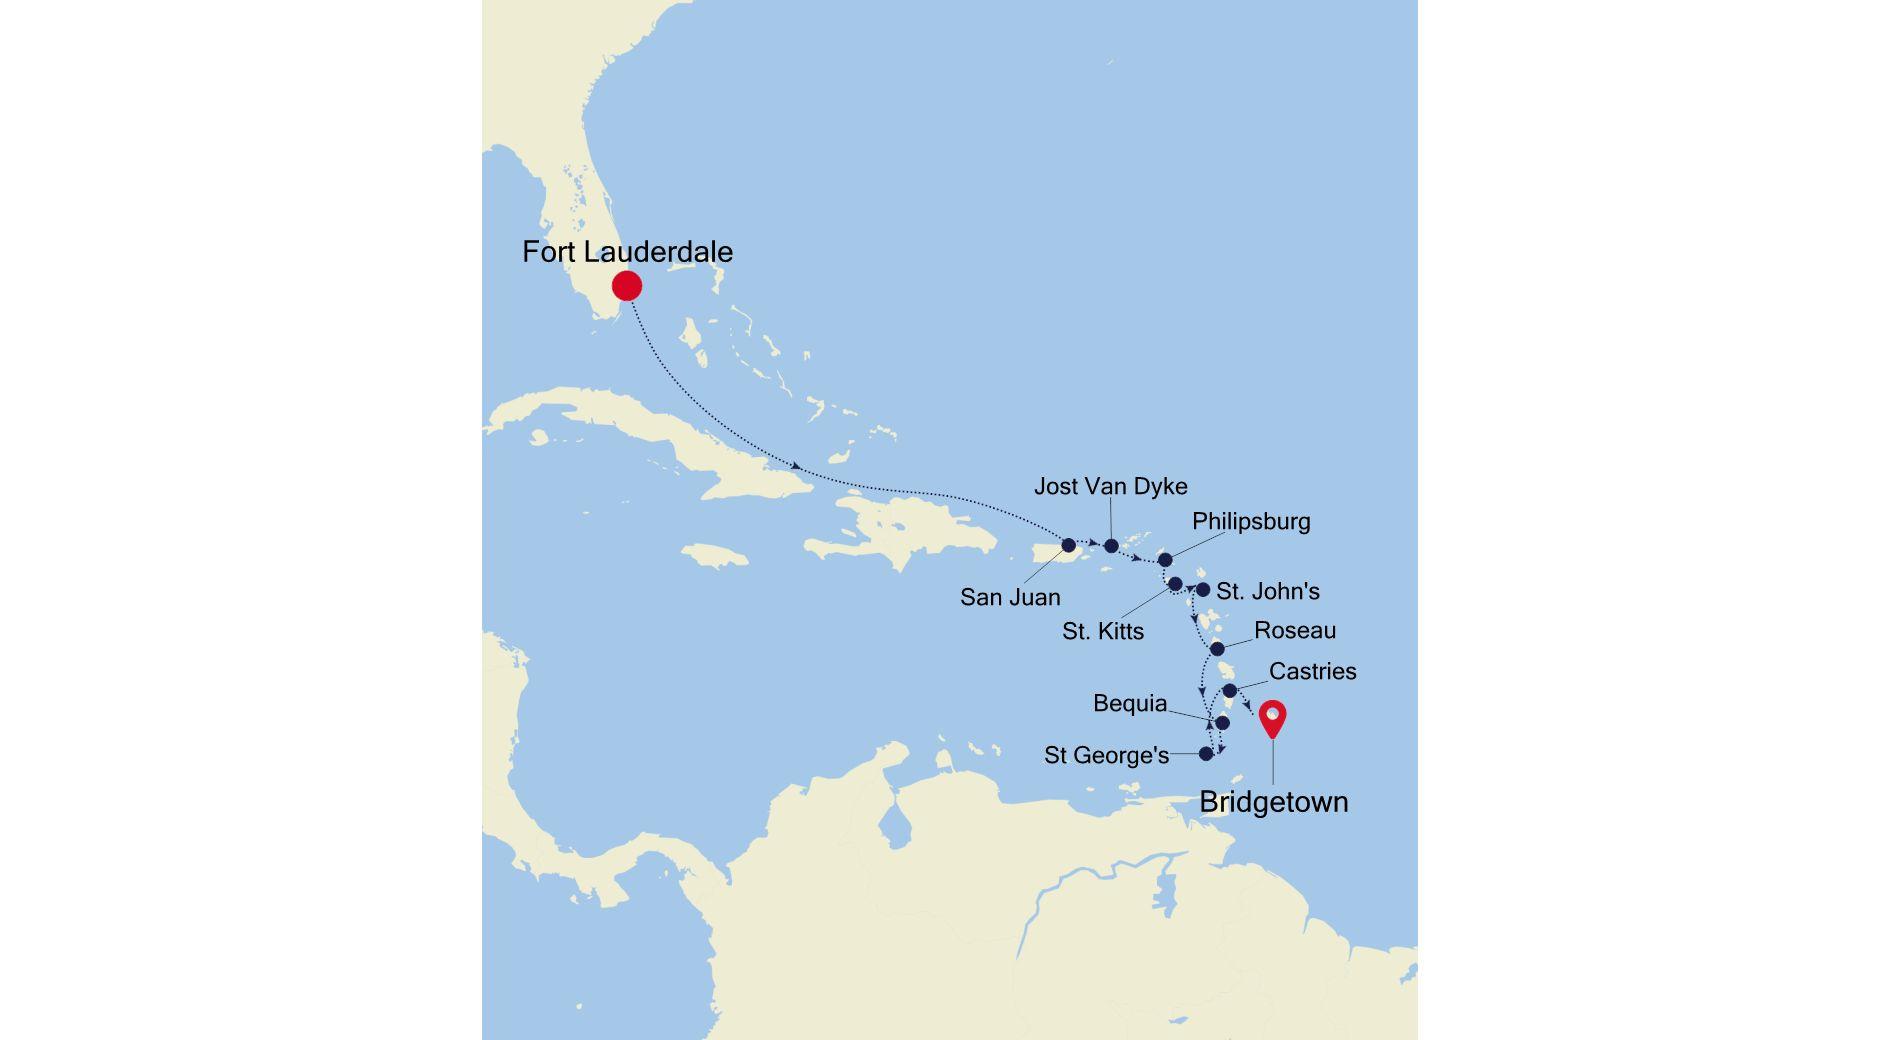 SL220308012 - Fort Lauderdale a Bridgetown